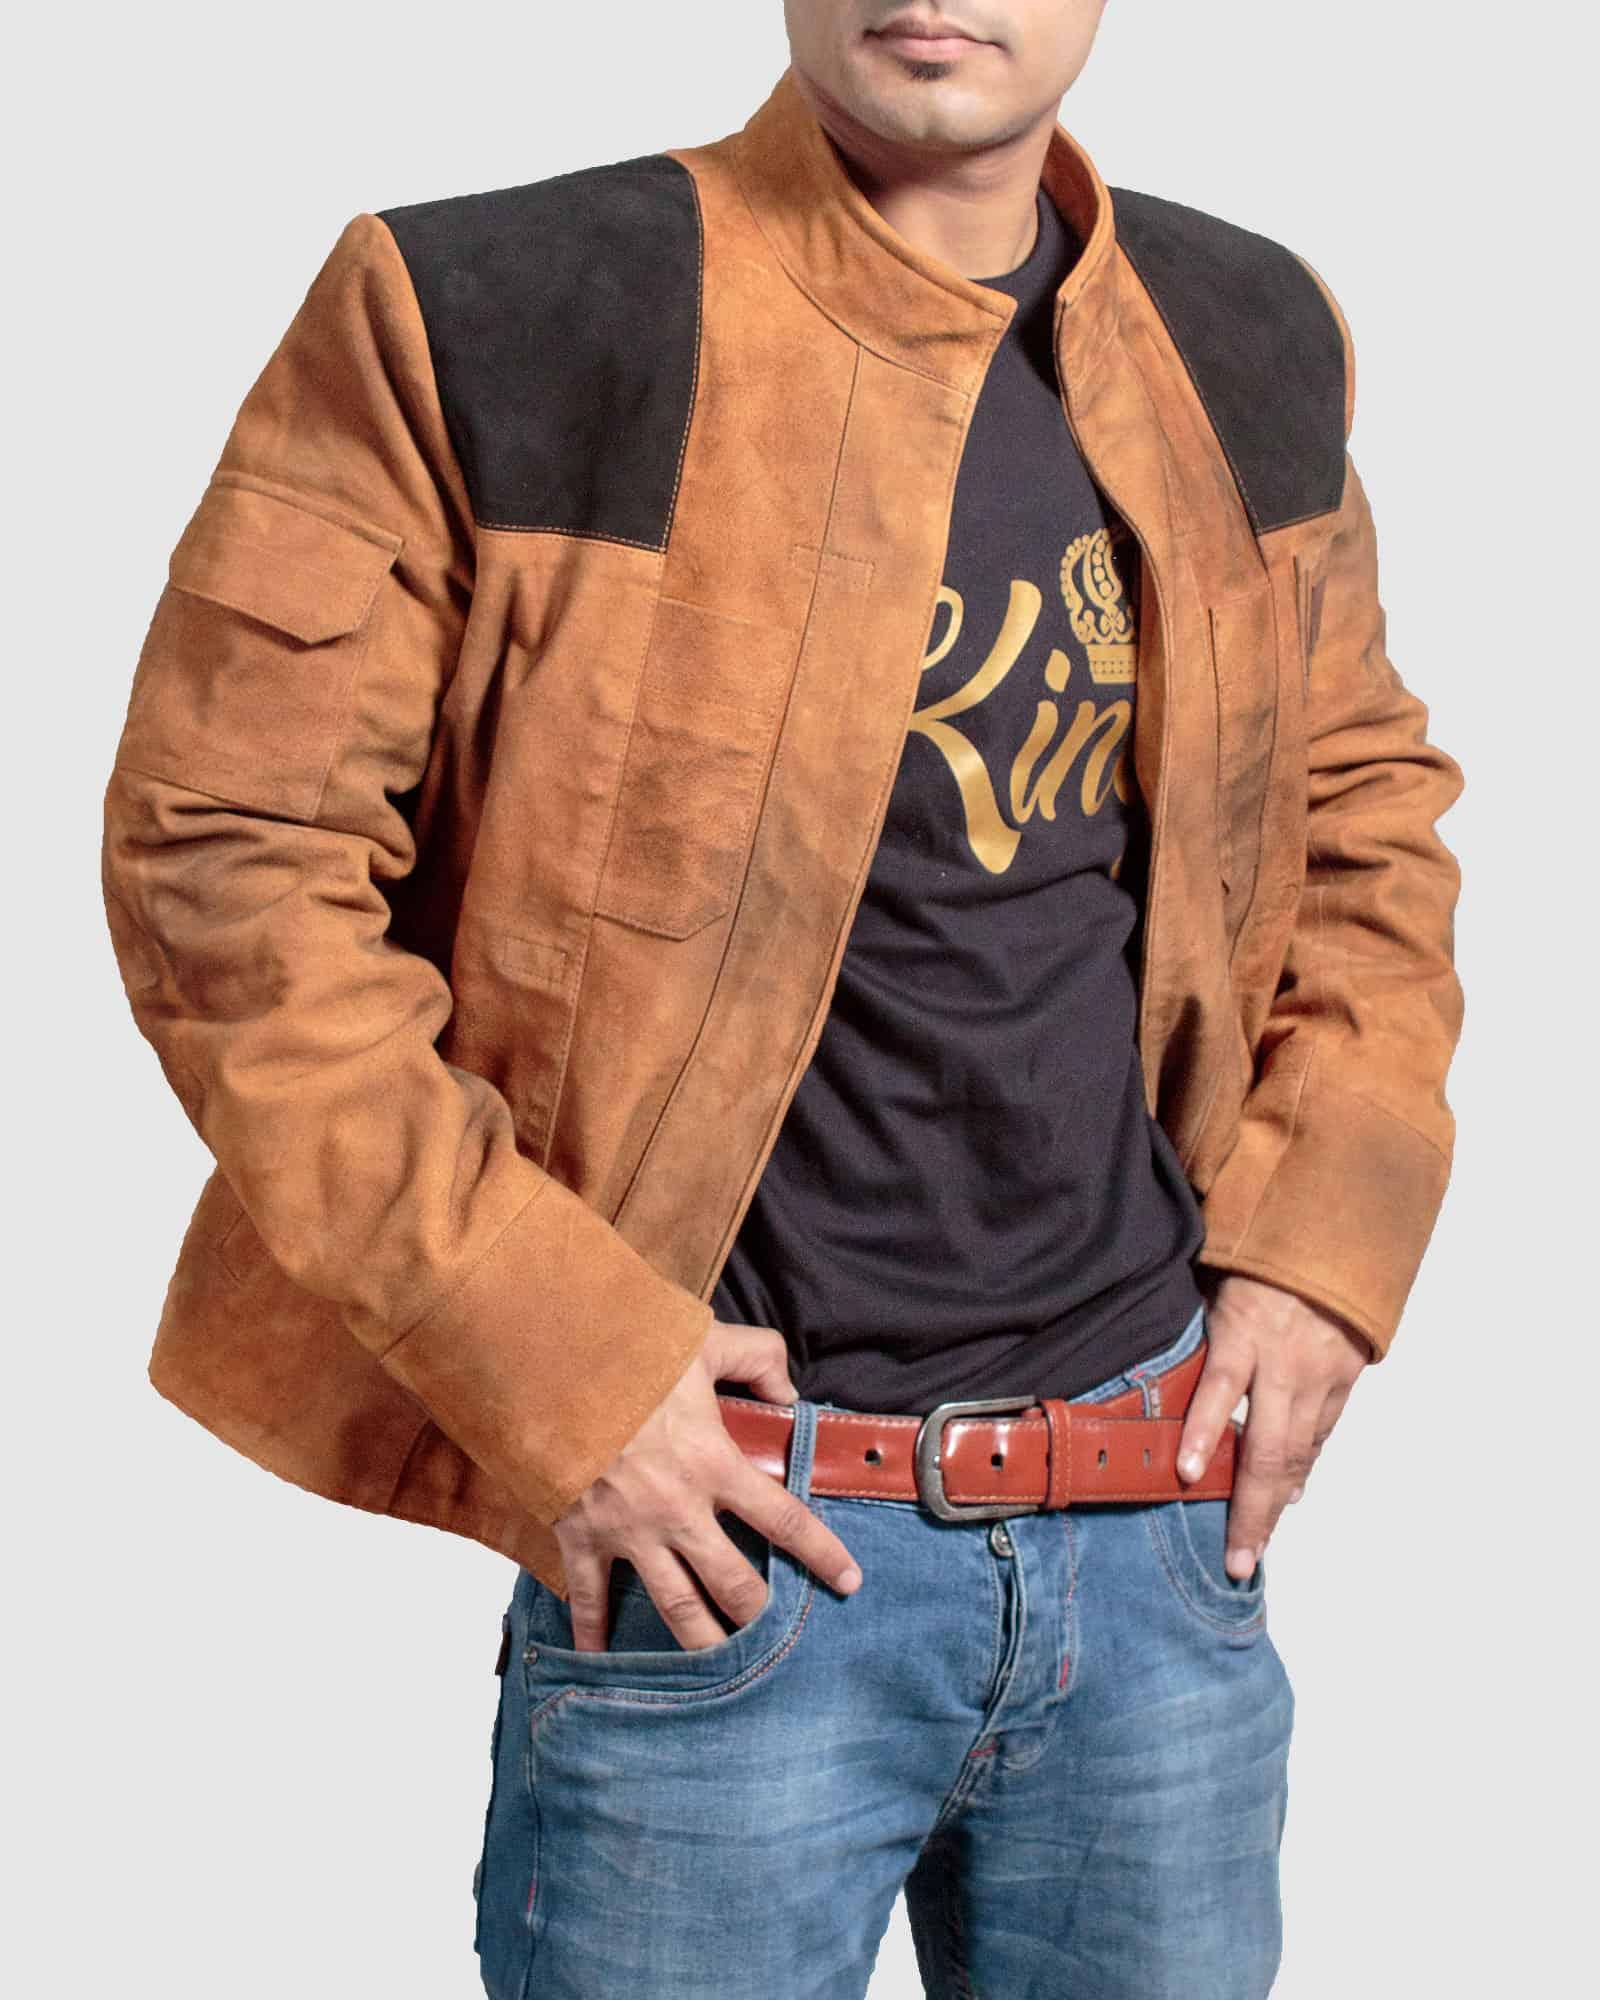 alden-ehrenreich-han-solo-jacket-e